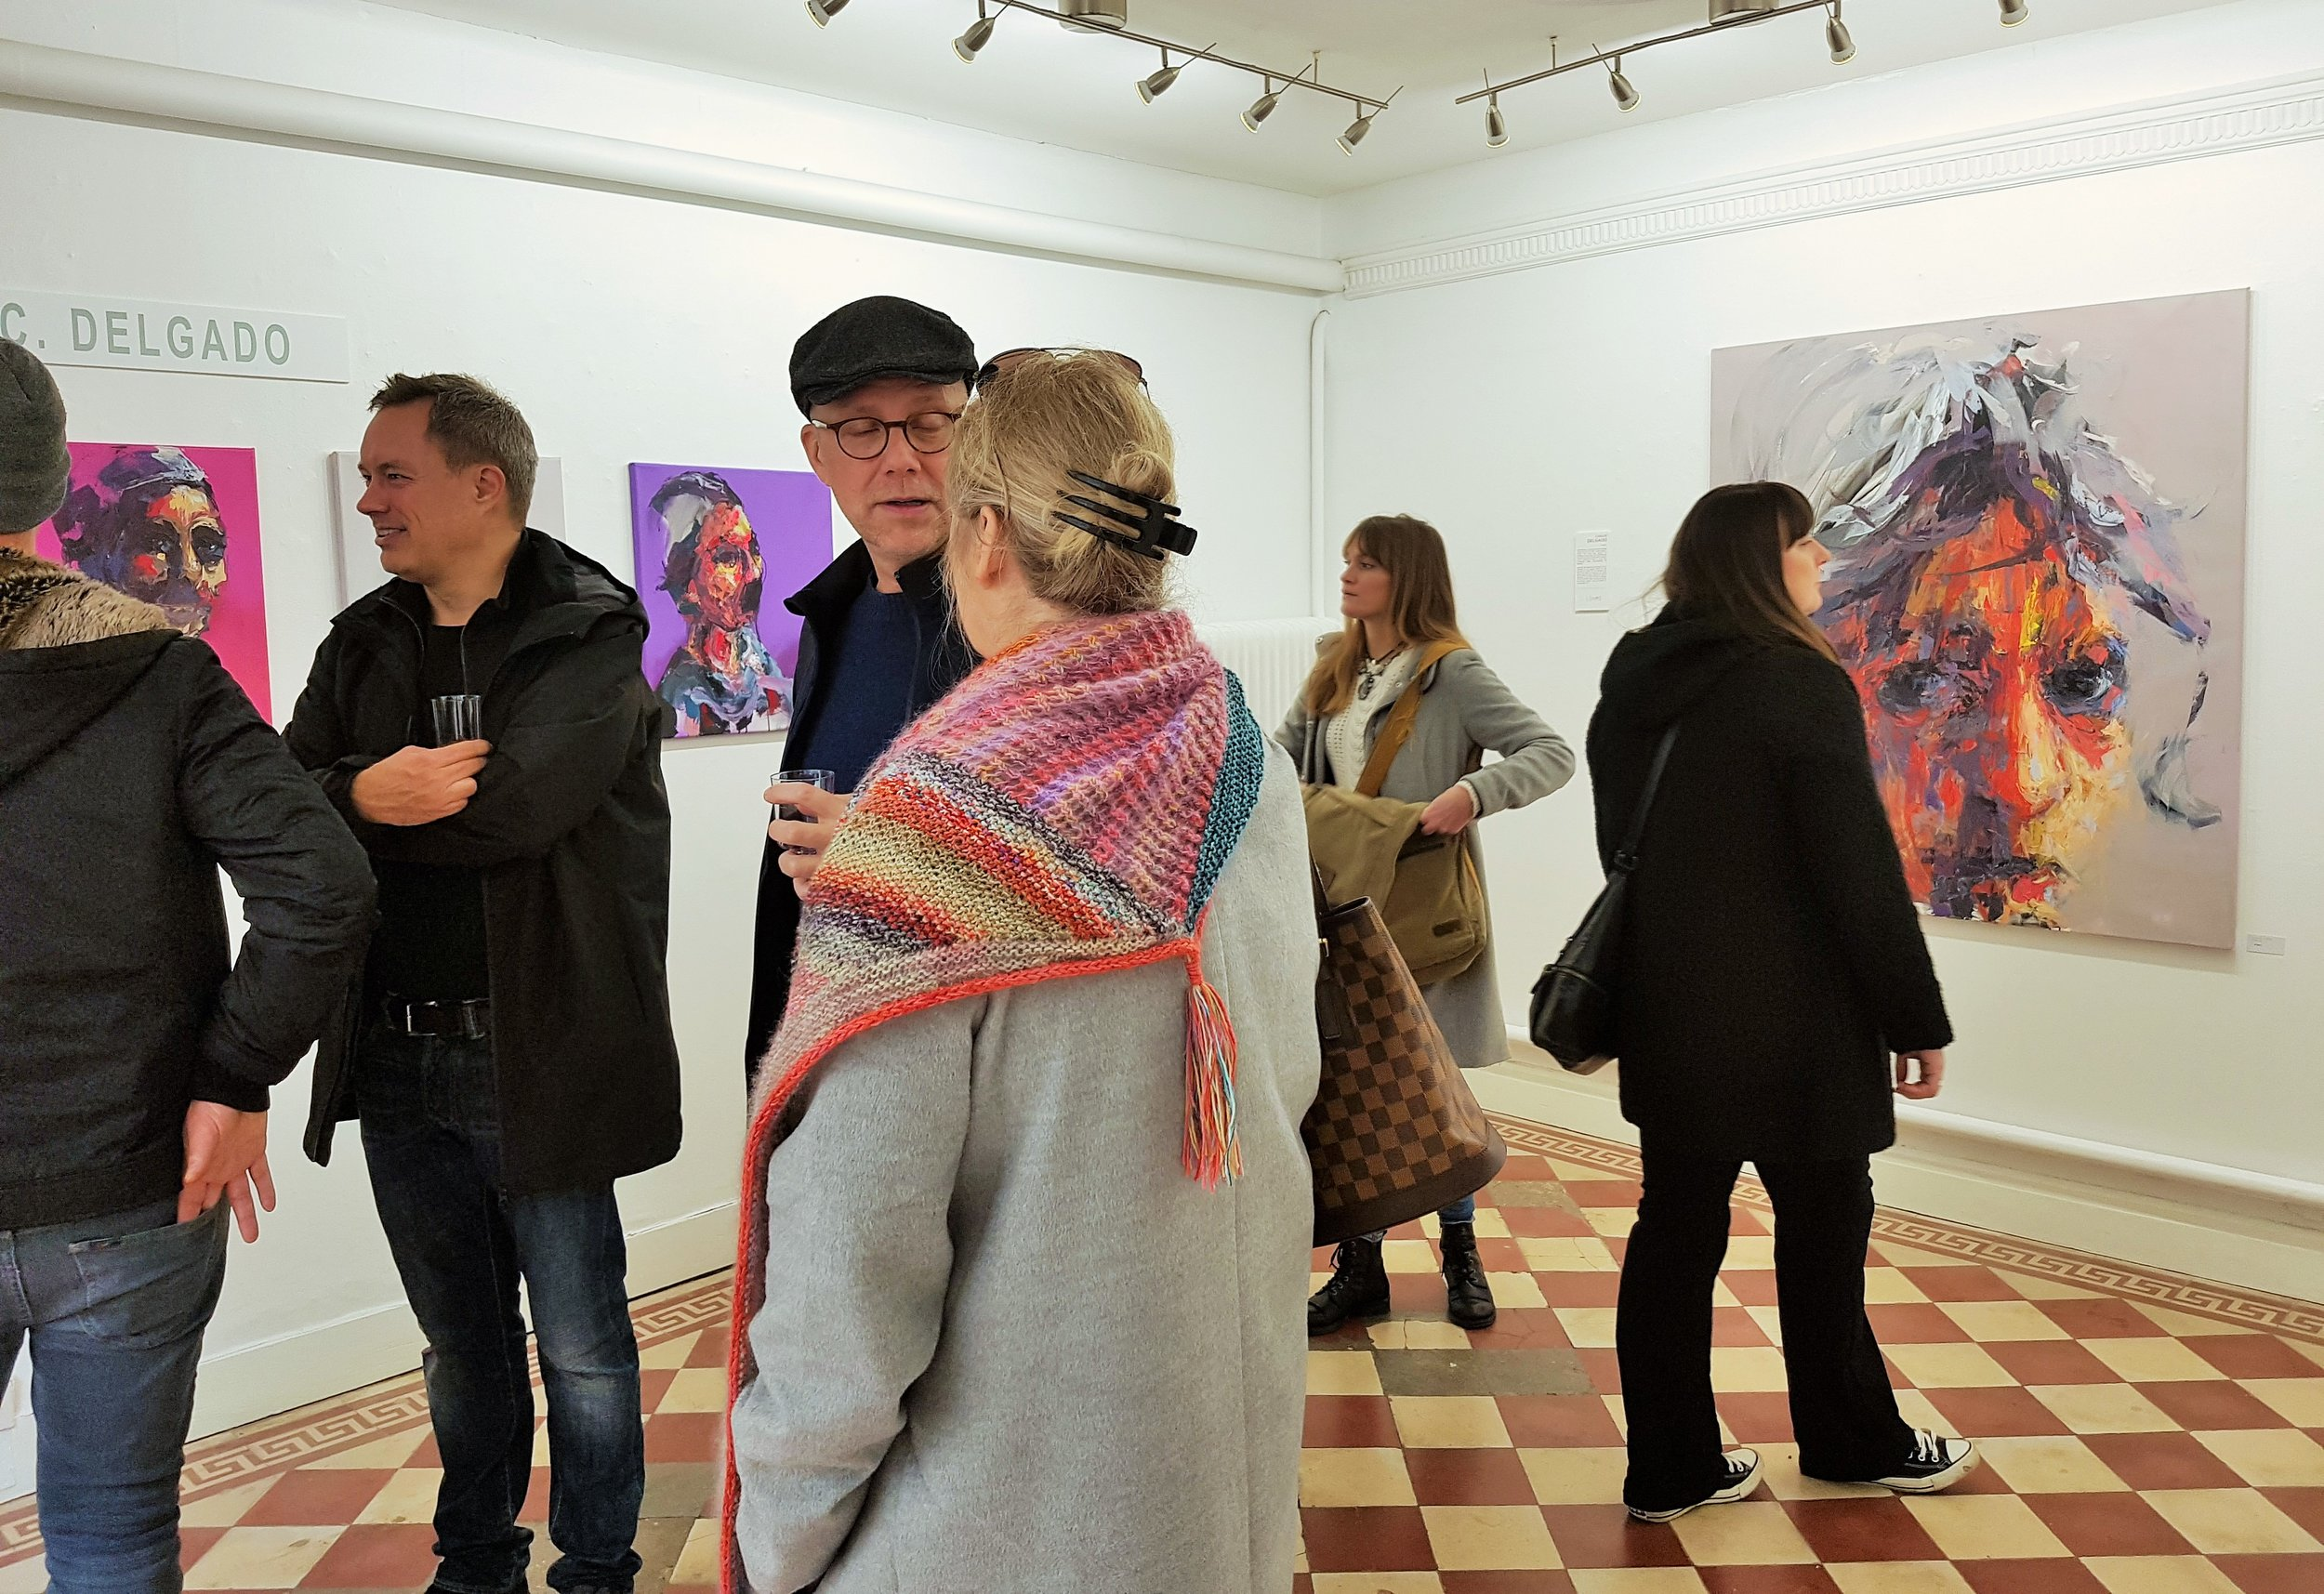 Solo art show in Malmo, Sweden at Galleri Lohme by Carlos Delgado